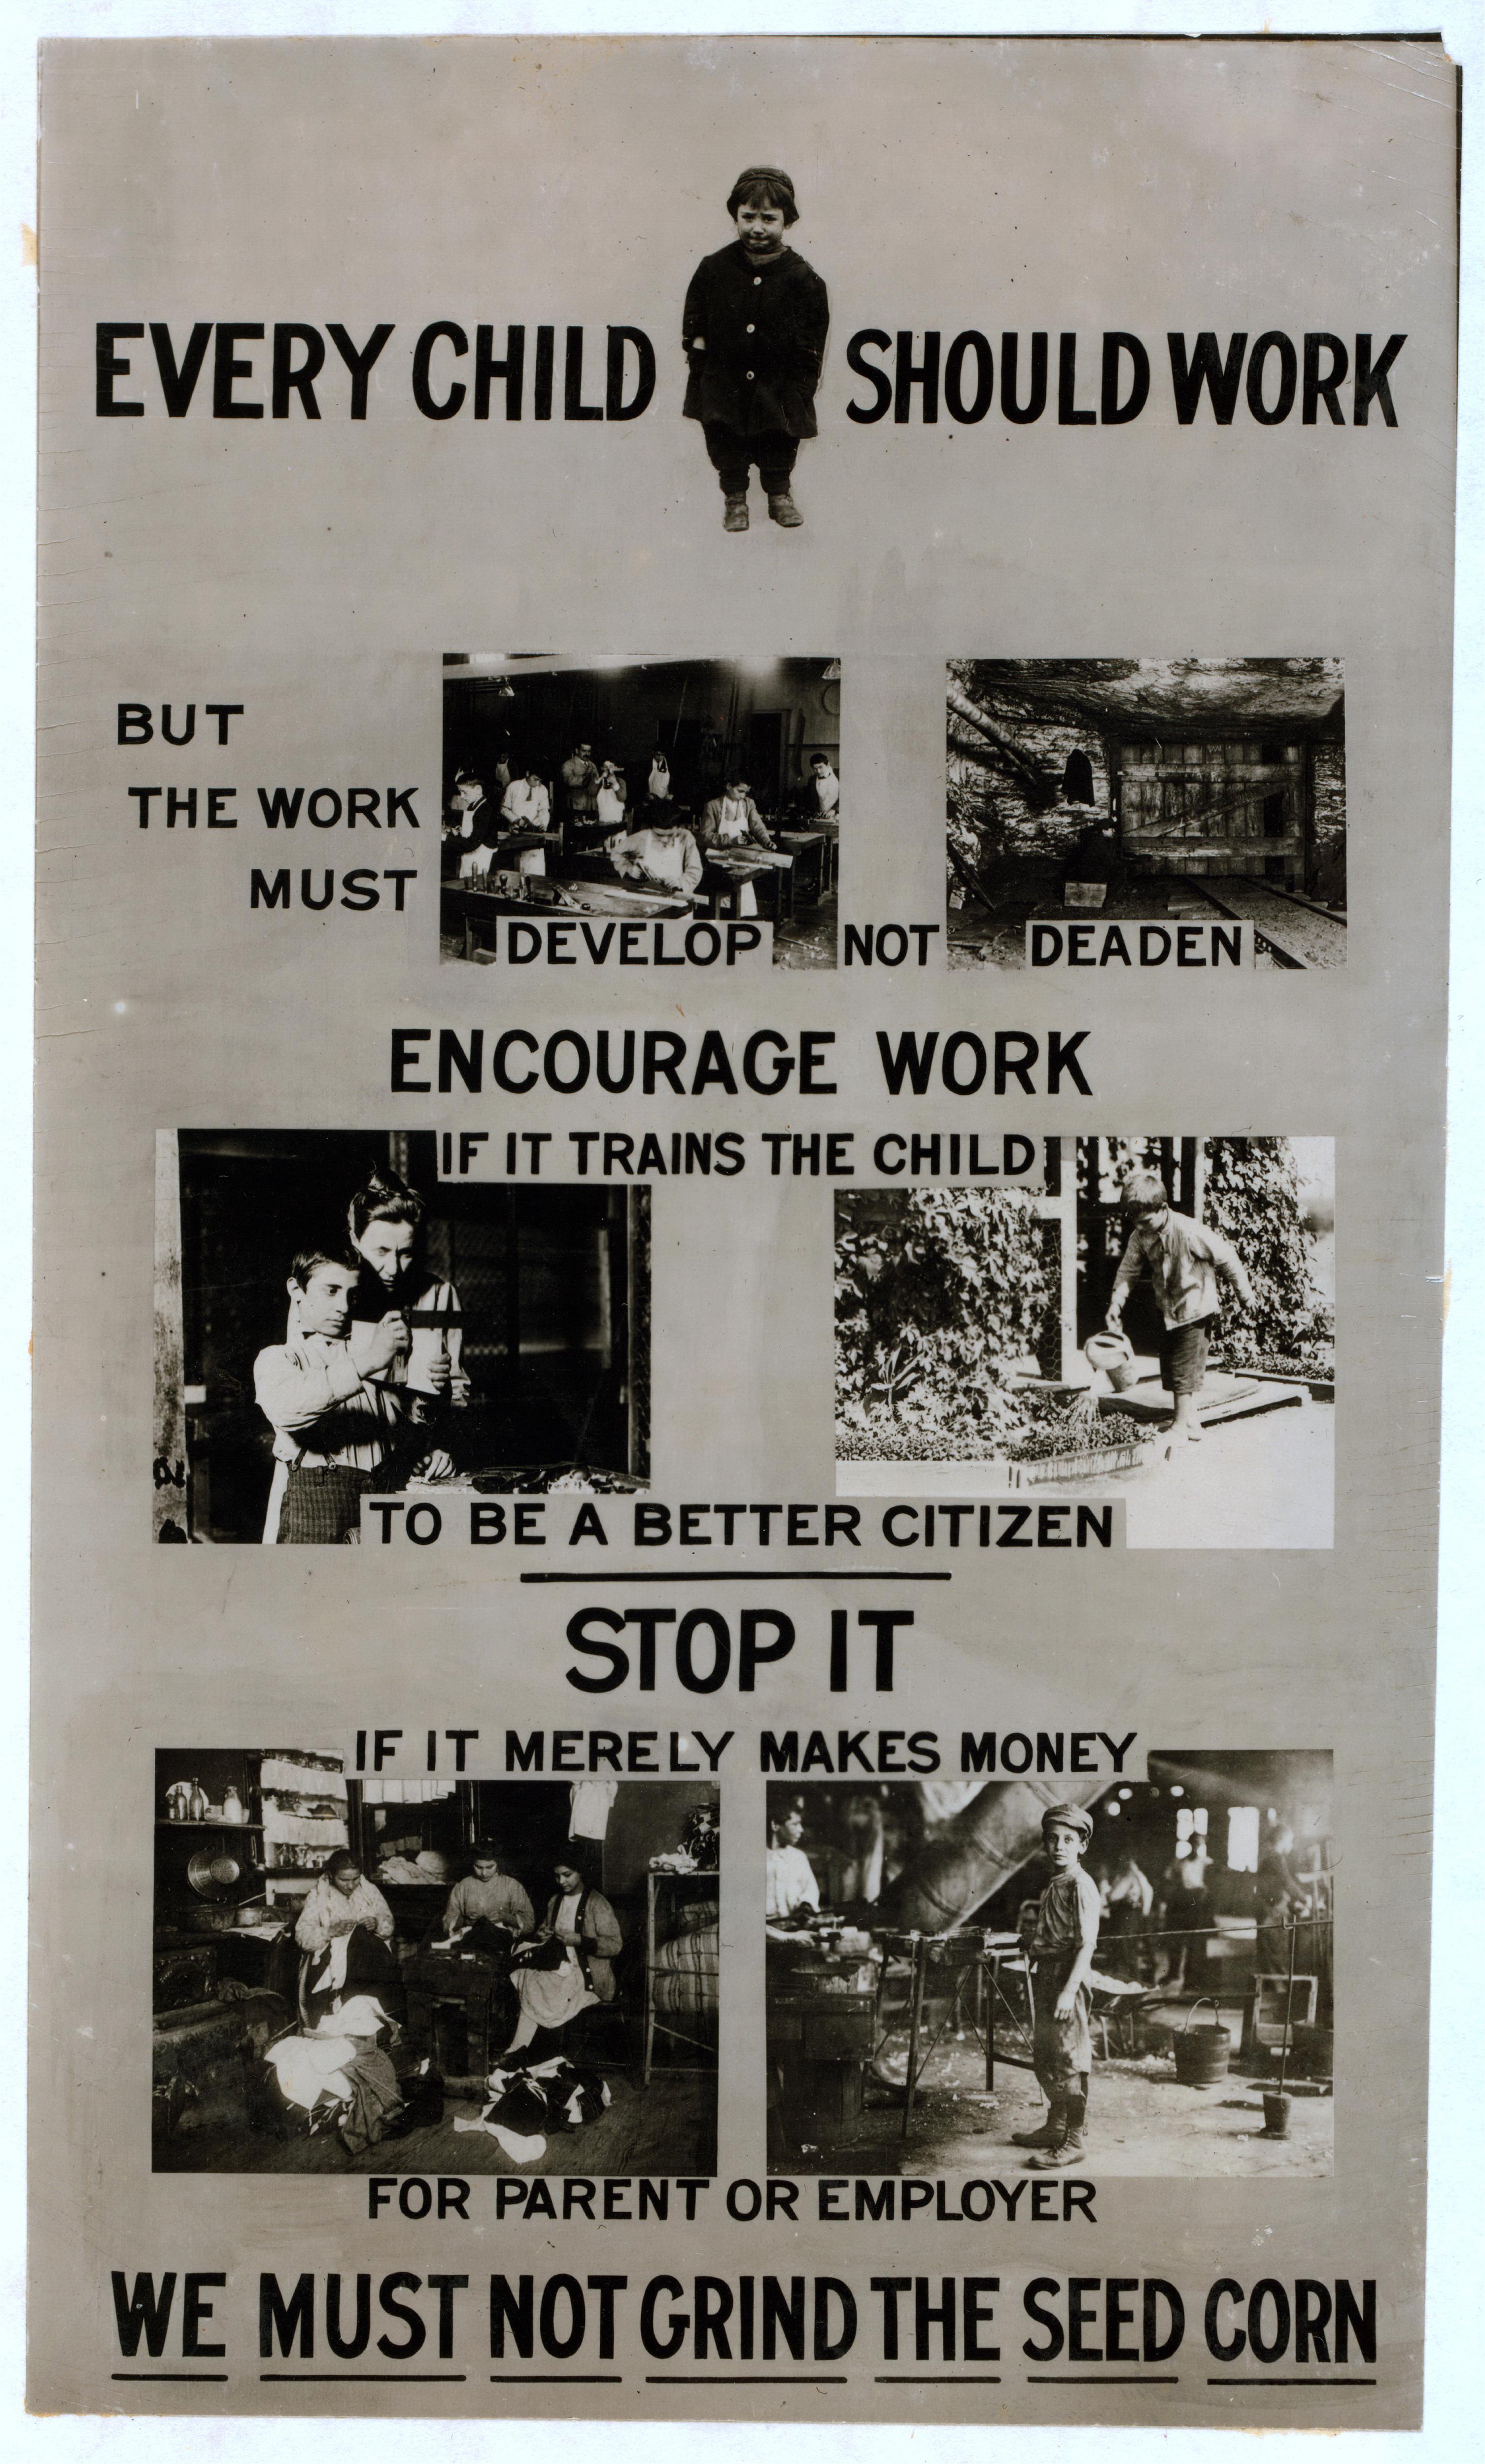 Pro Child Labor Poster 1915 Propagandaposters